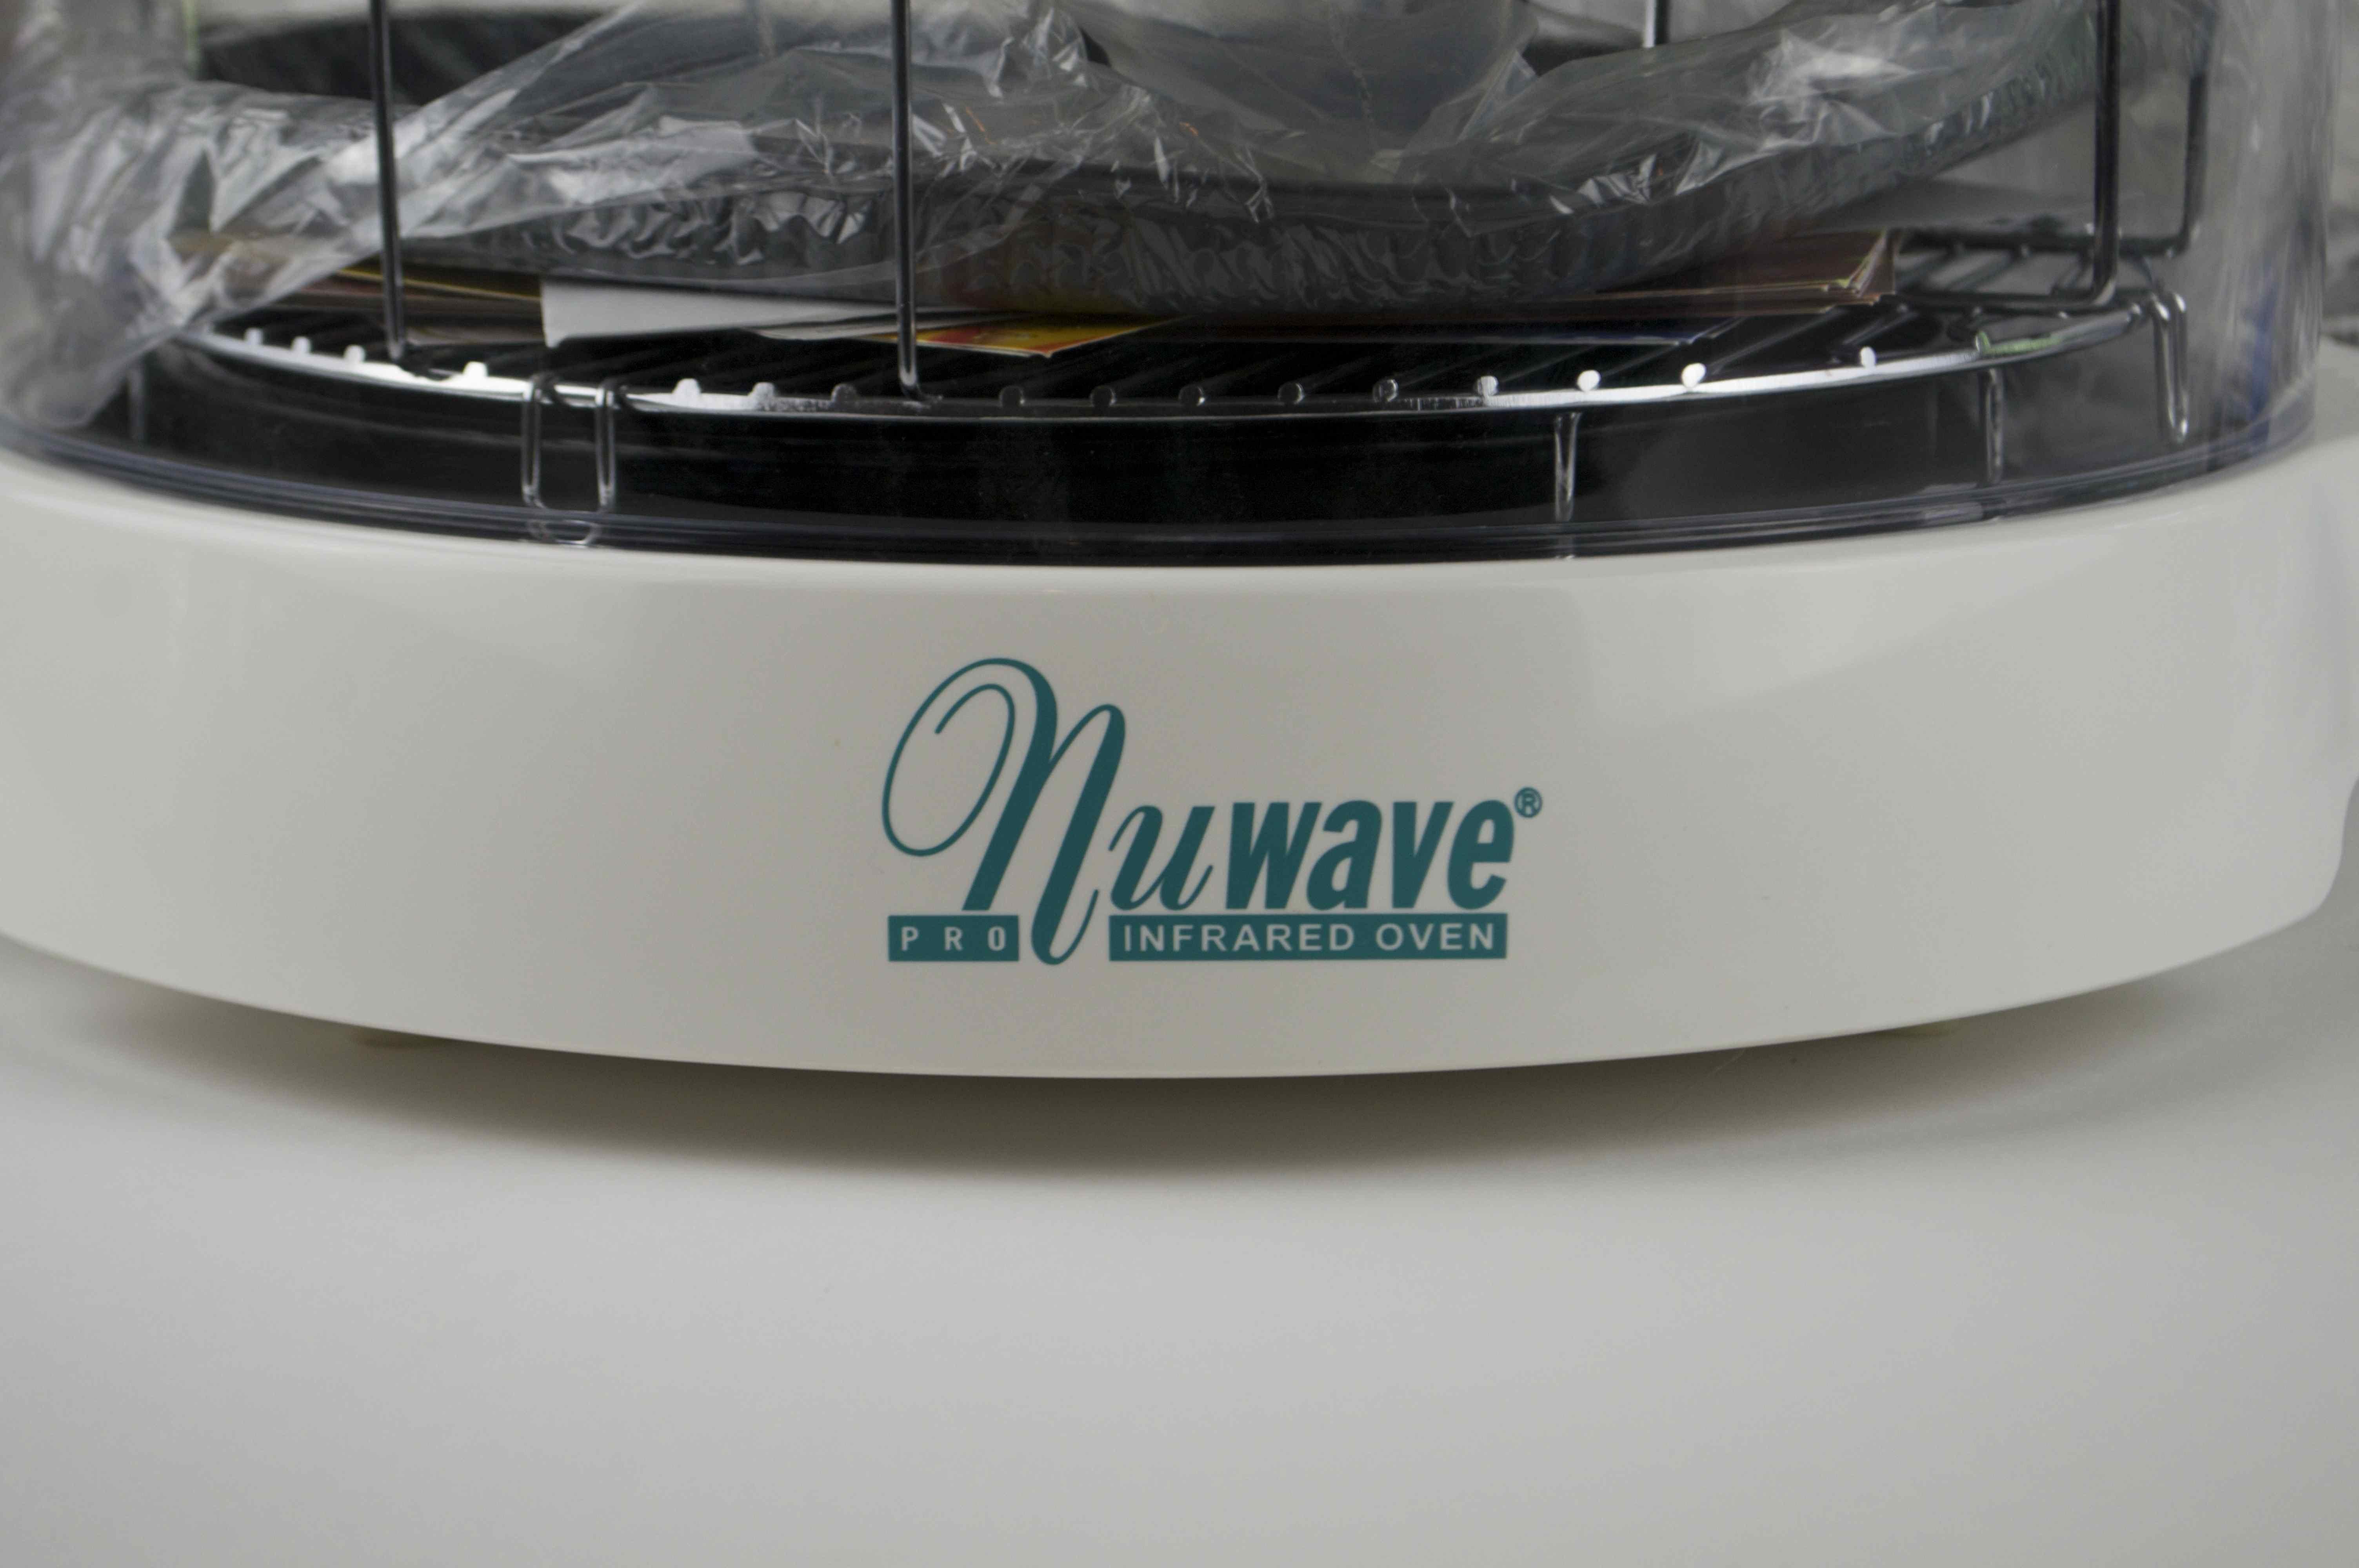 Nuwave Pro Infrared Oven Ebth